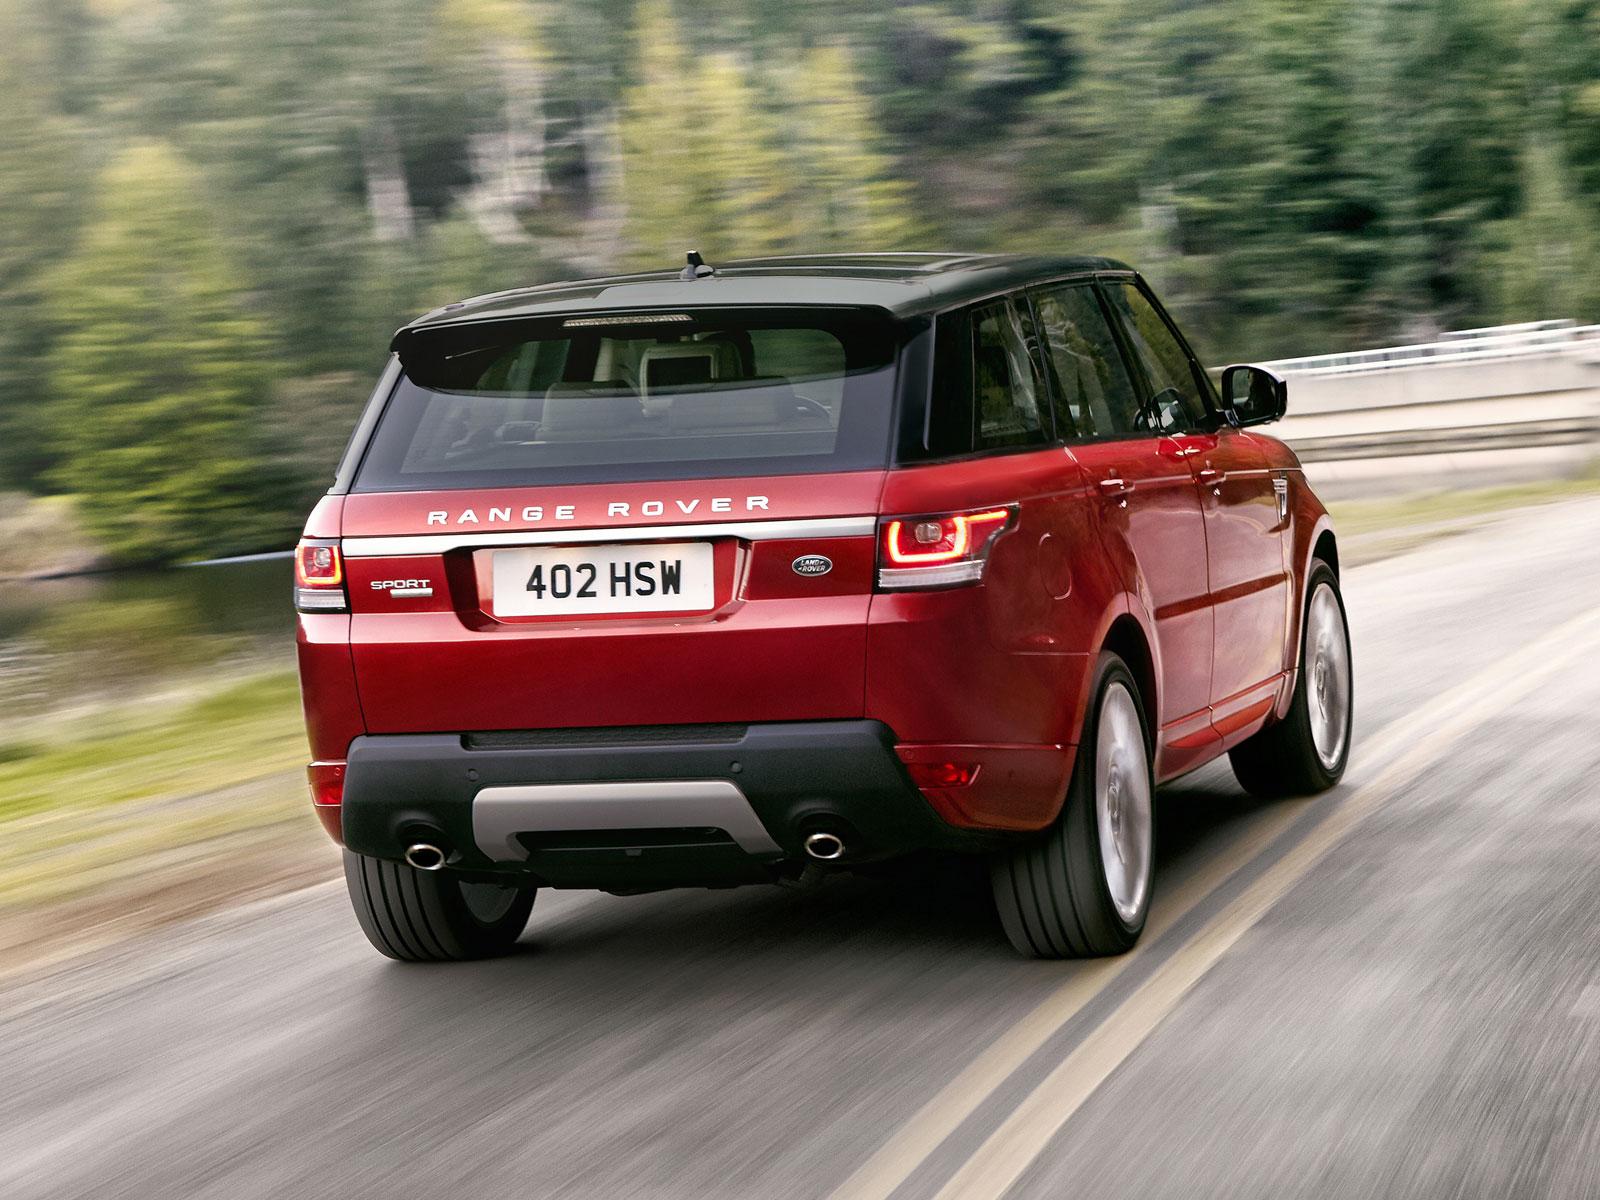 2013 Range Rover Sport (c) Land Rover